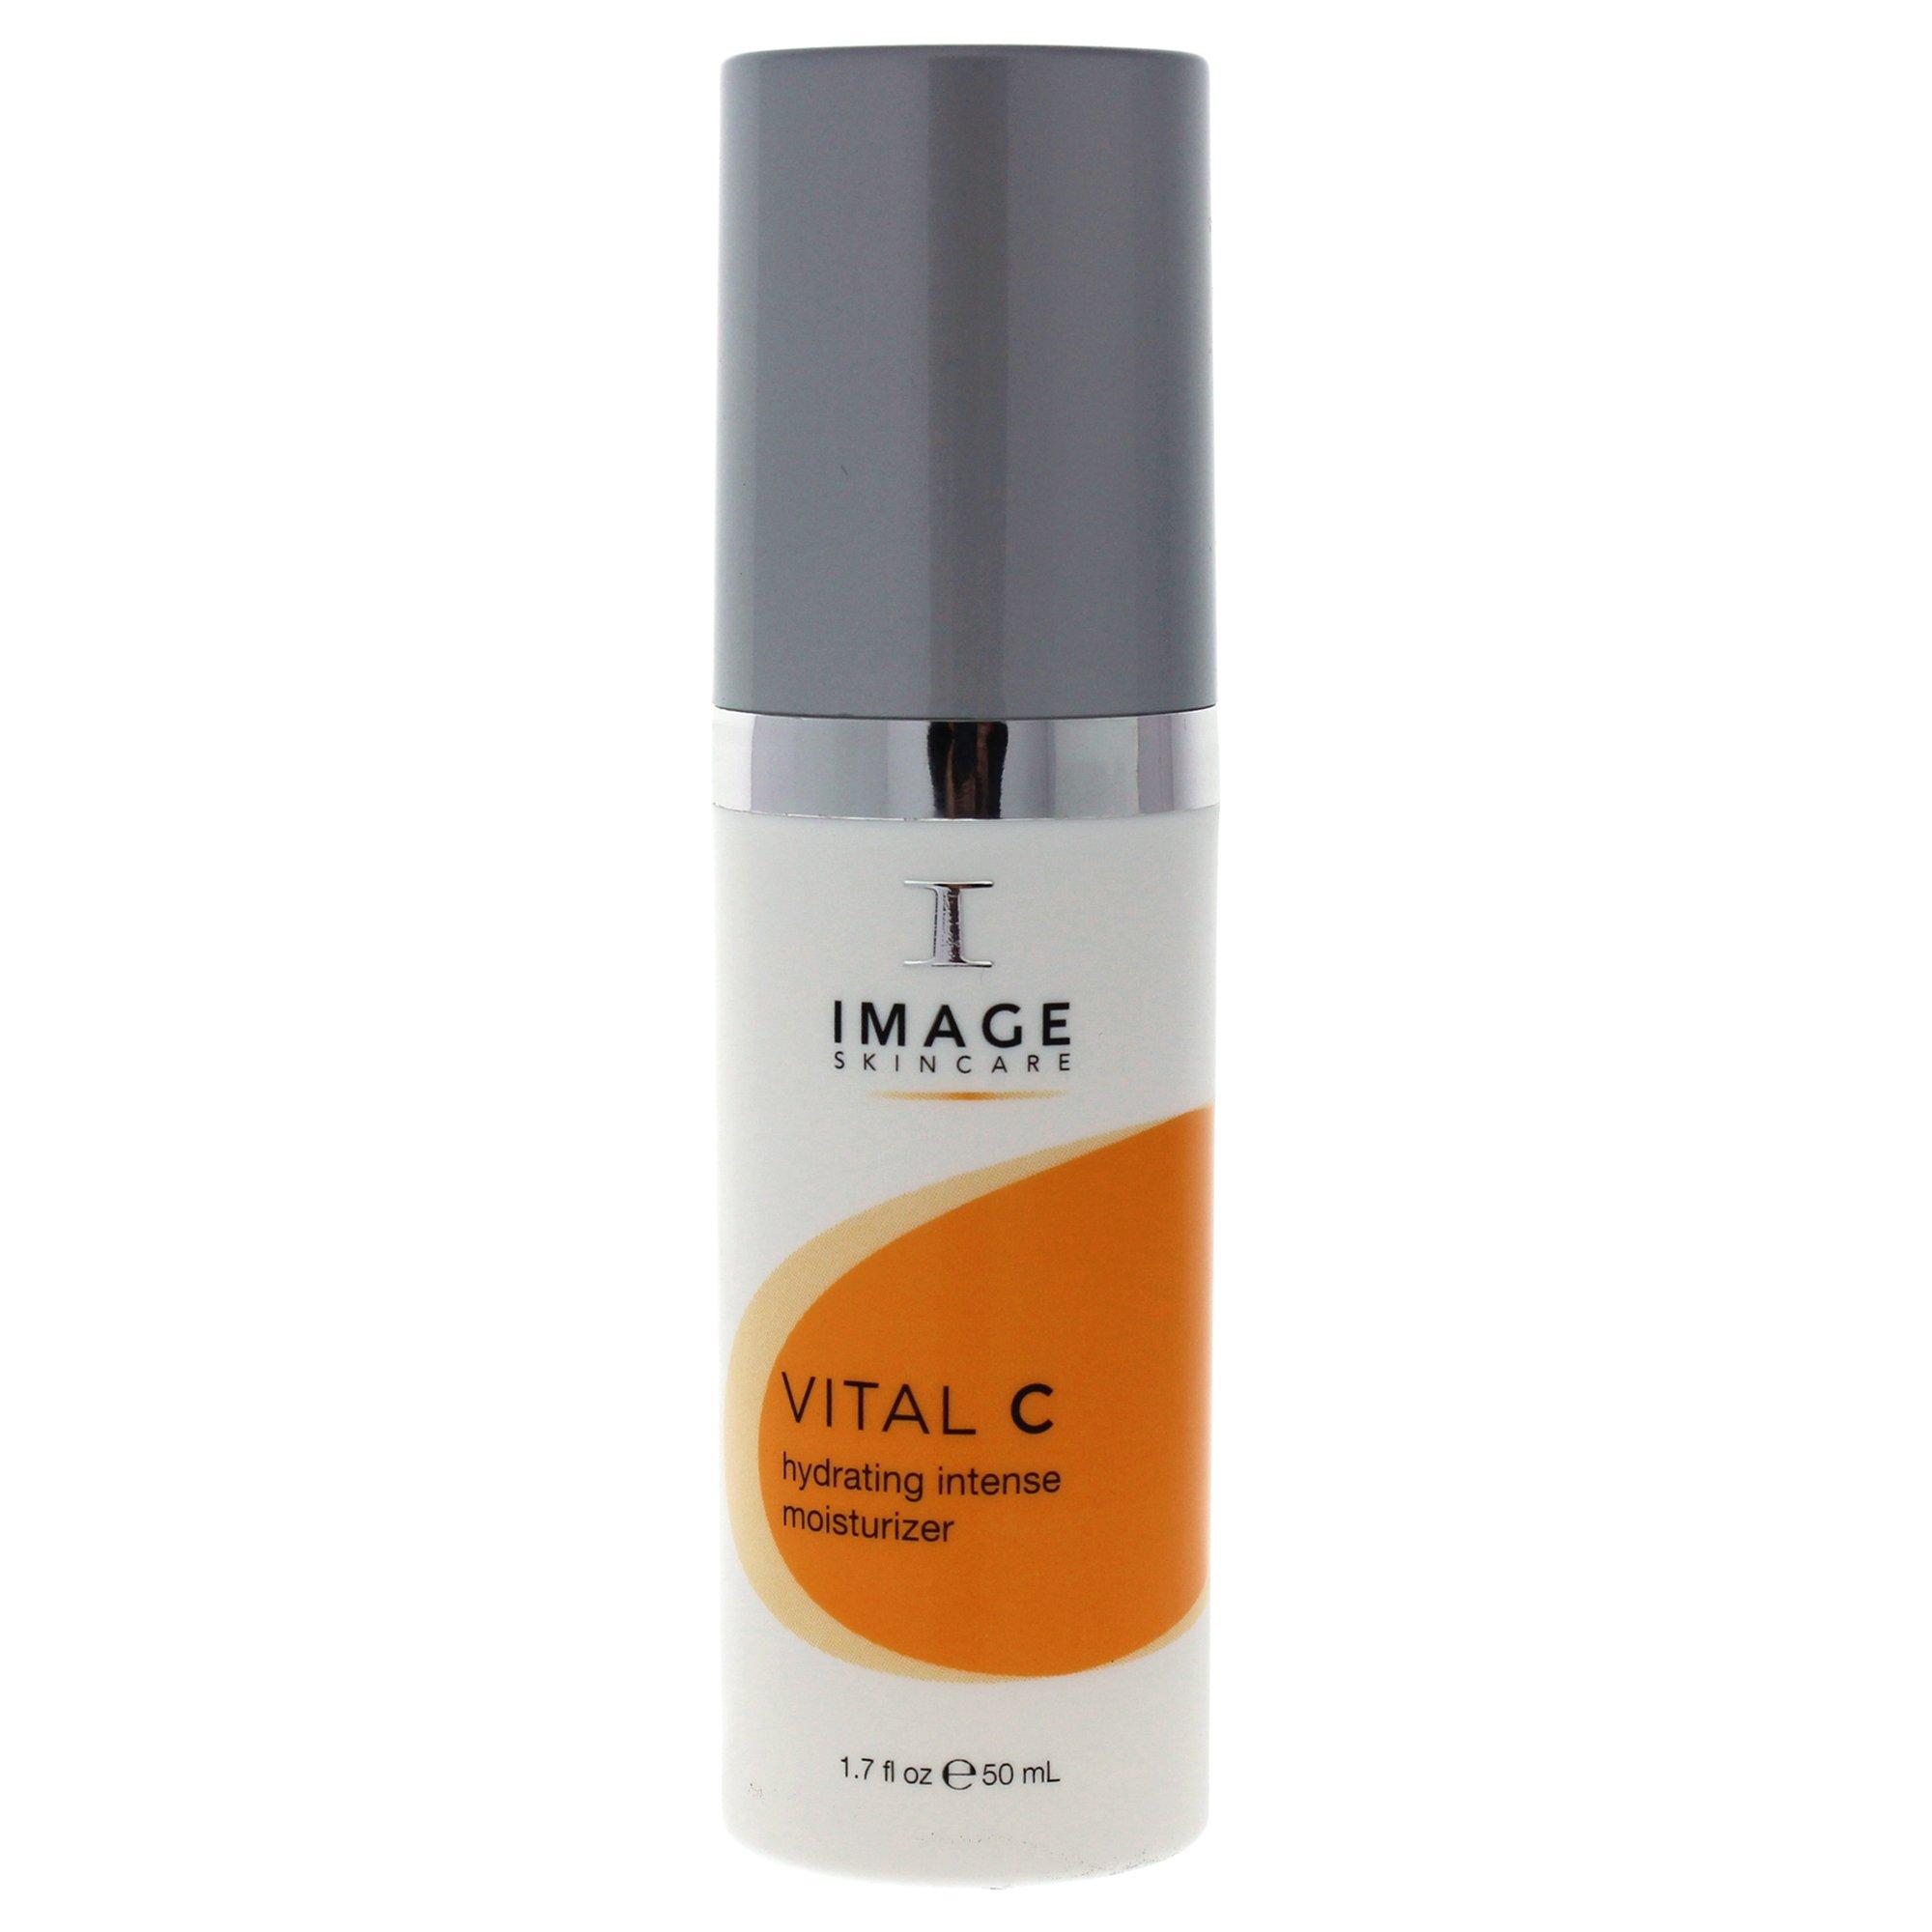 Image Skincare Vital C Hydrating Intense Moisturizer, 1.7 Oz by Image Skincare